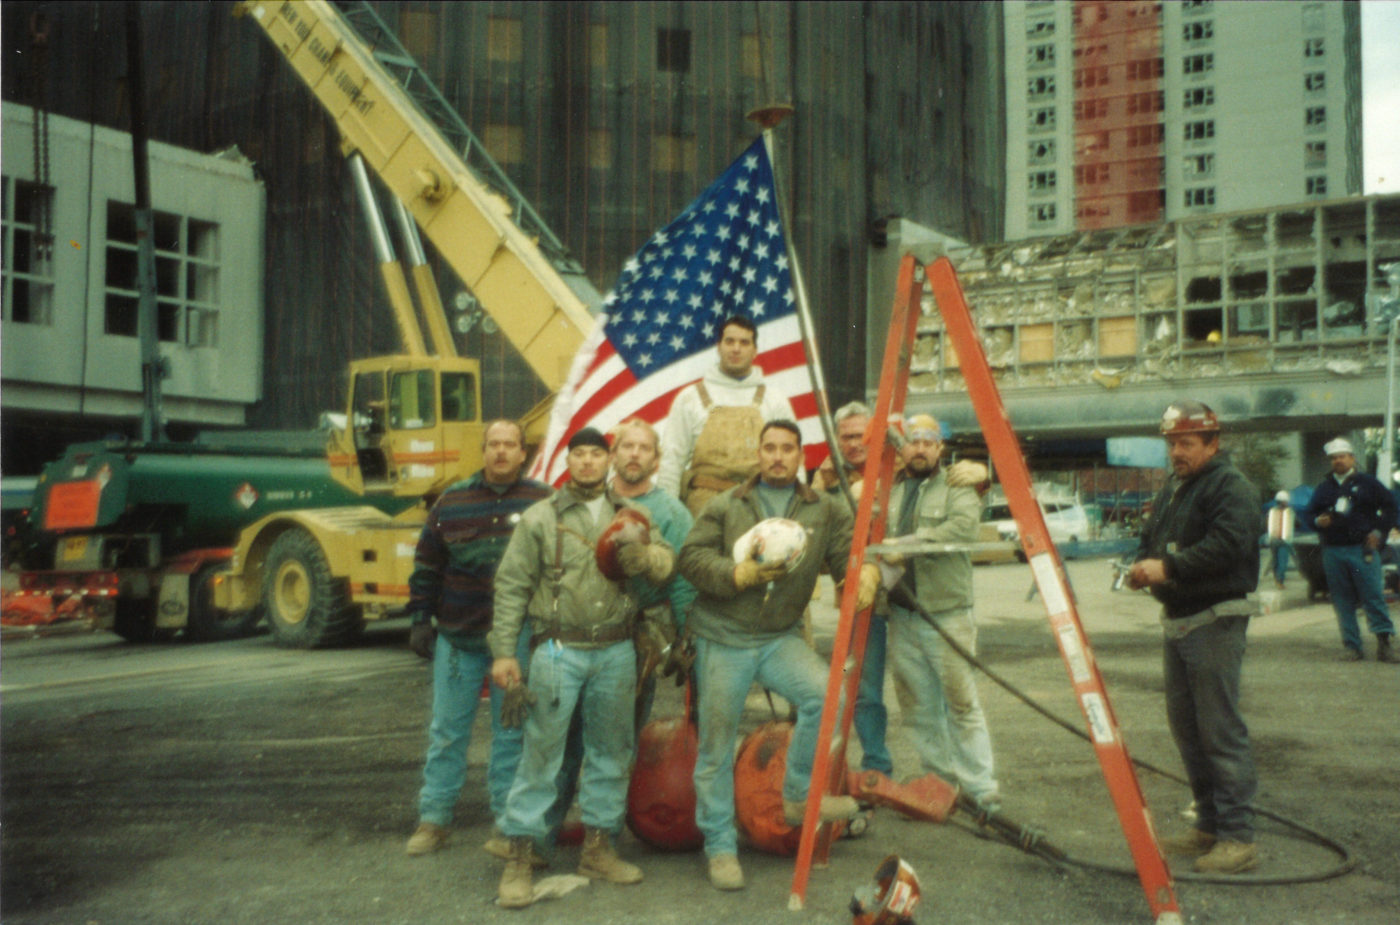 Workers at Ground Zero (2)